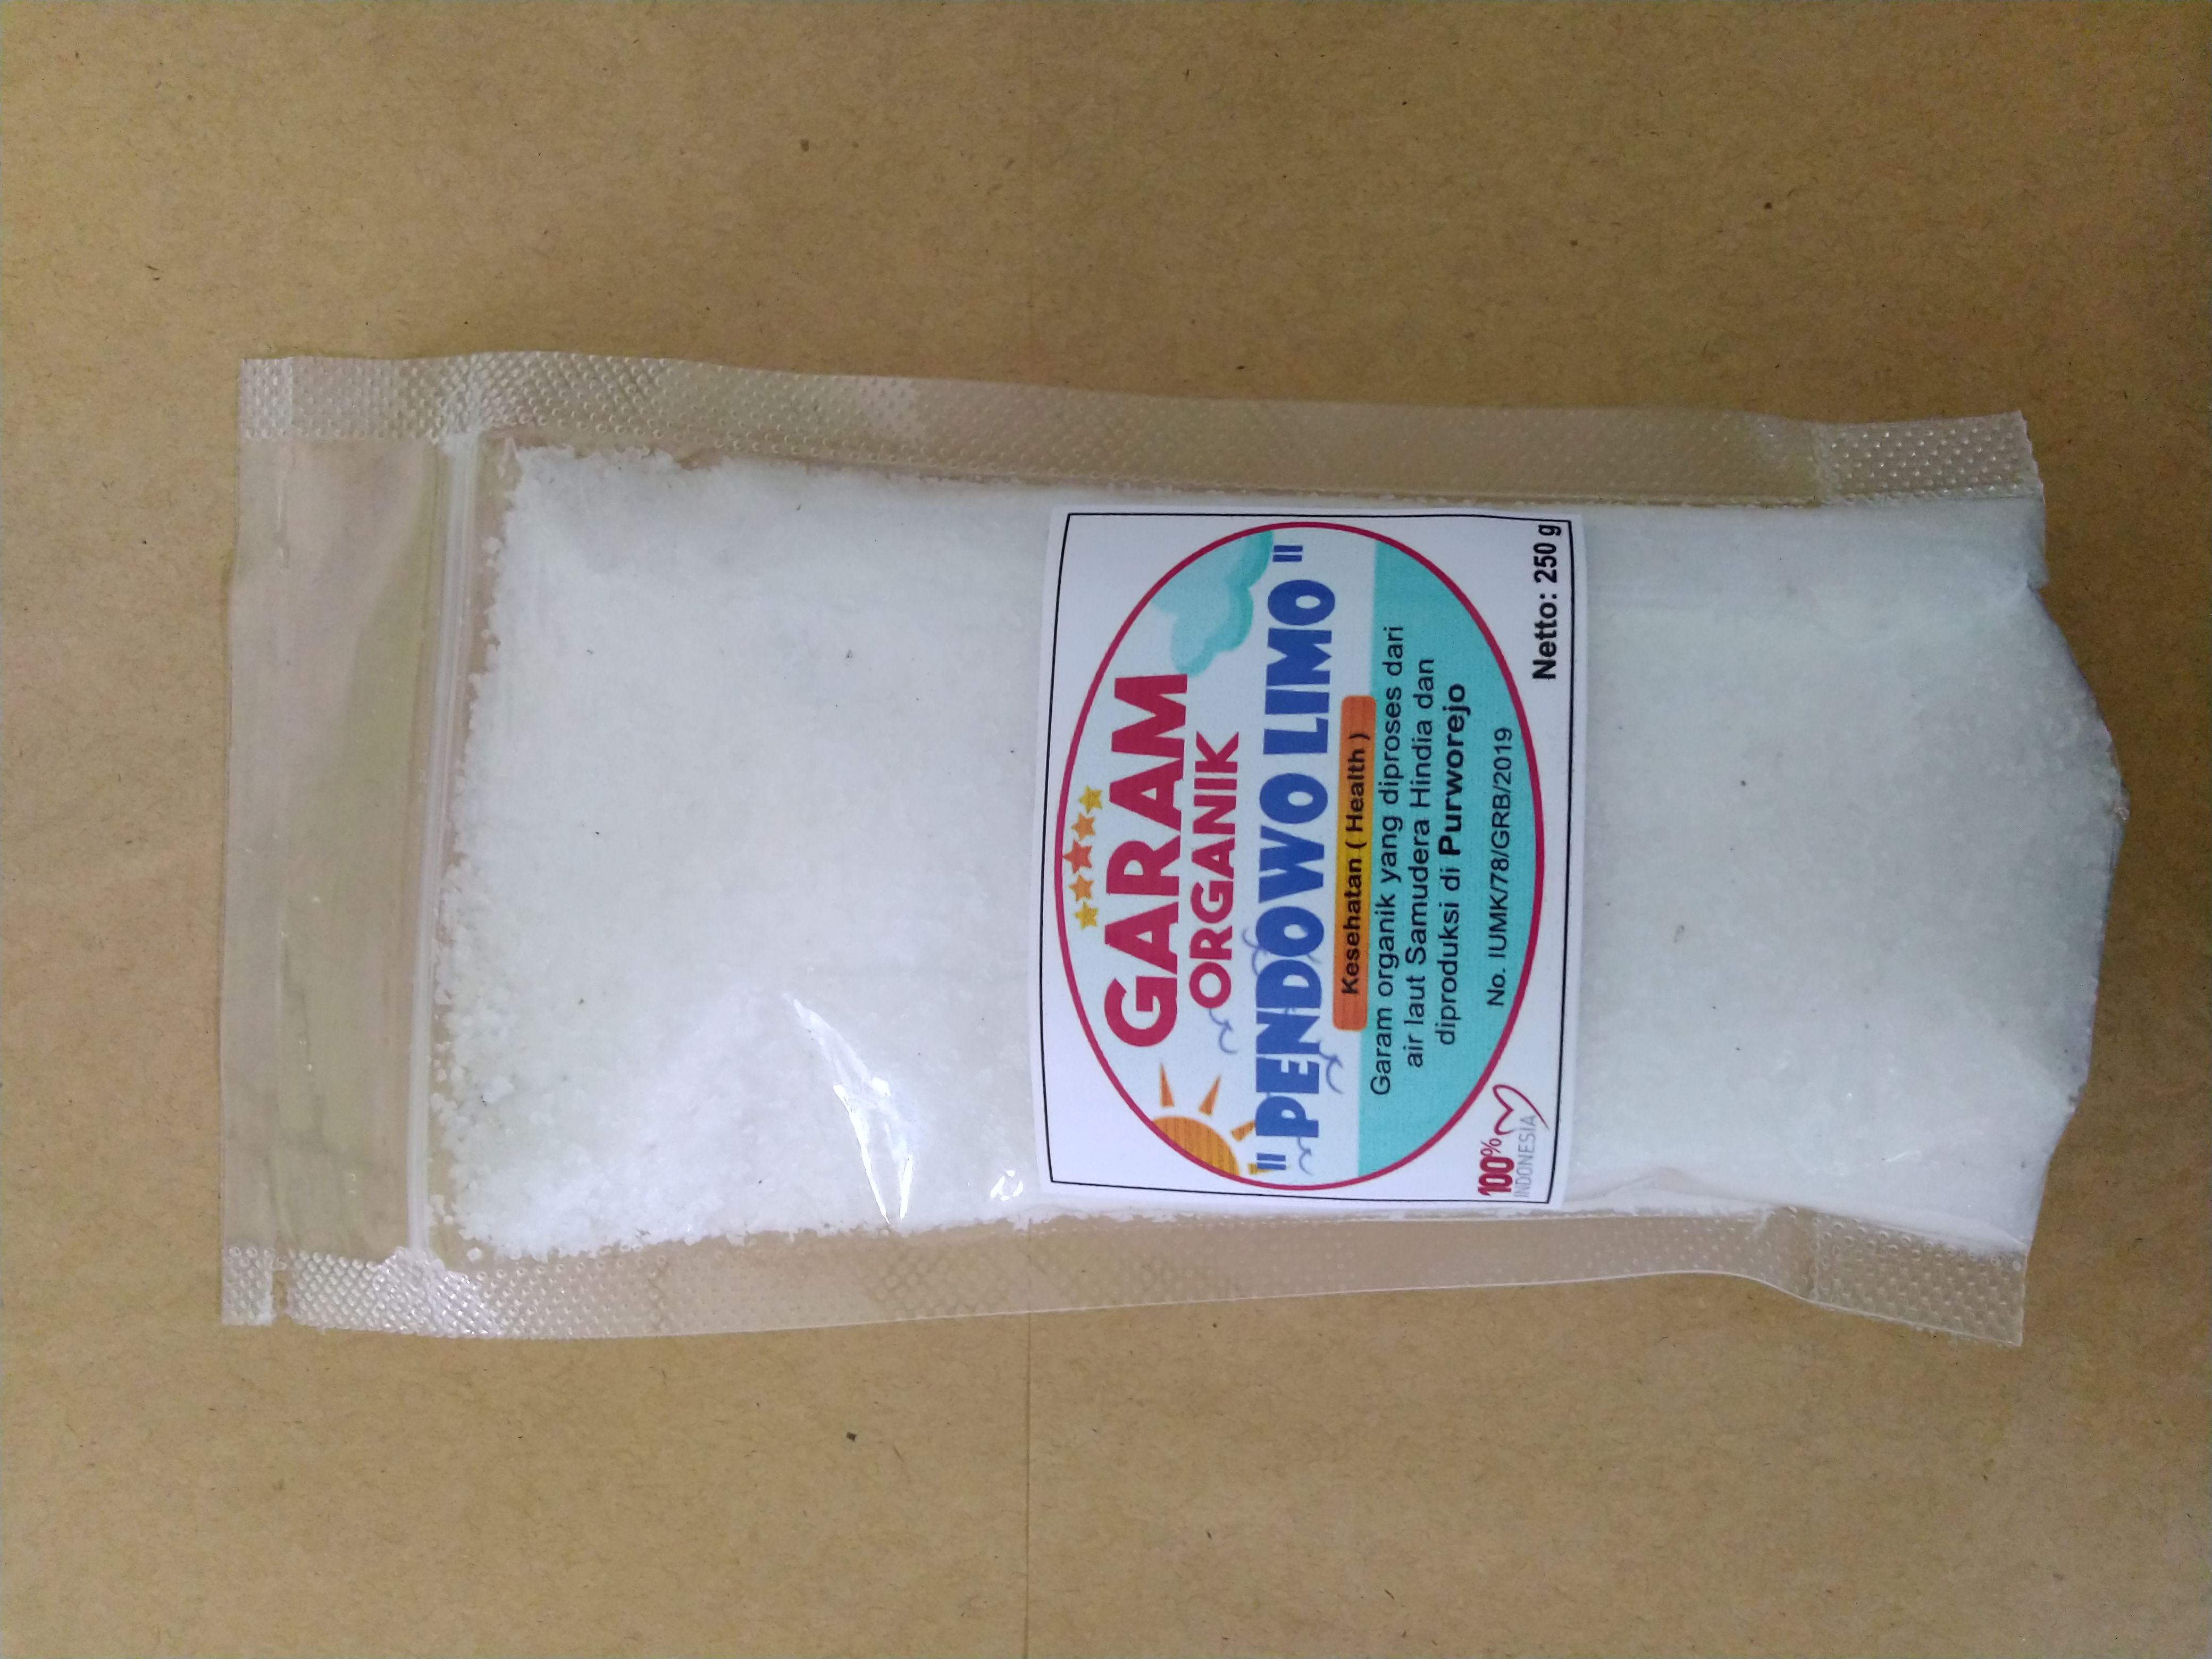 Garam organik